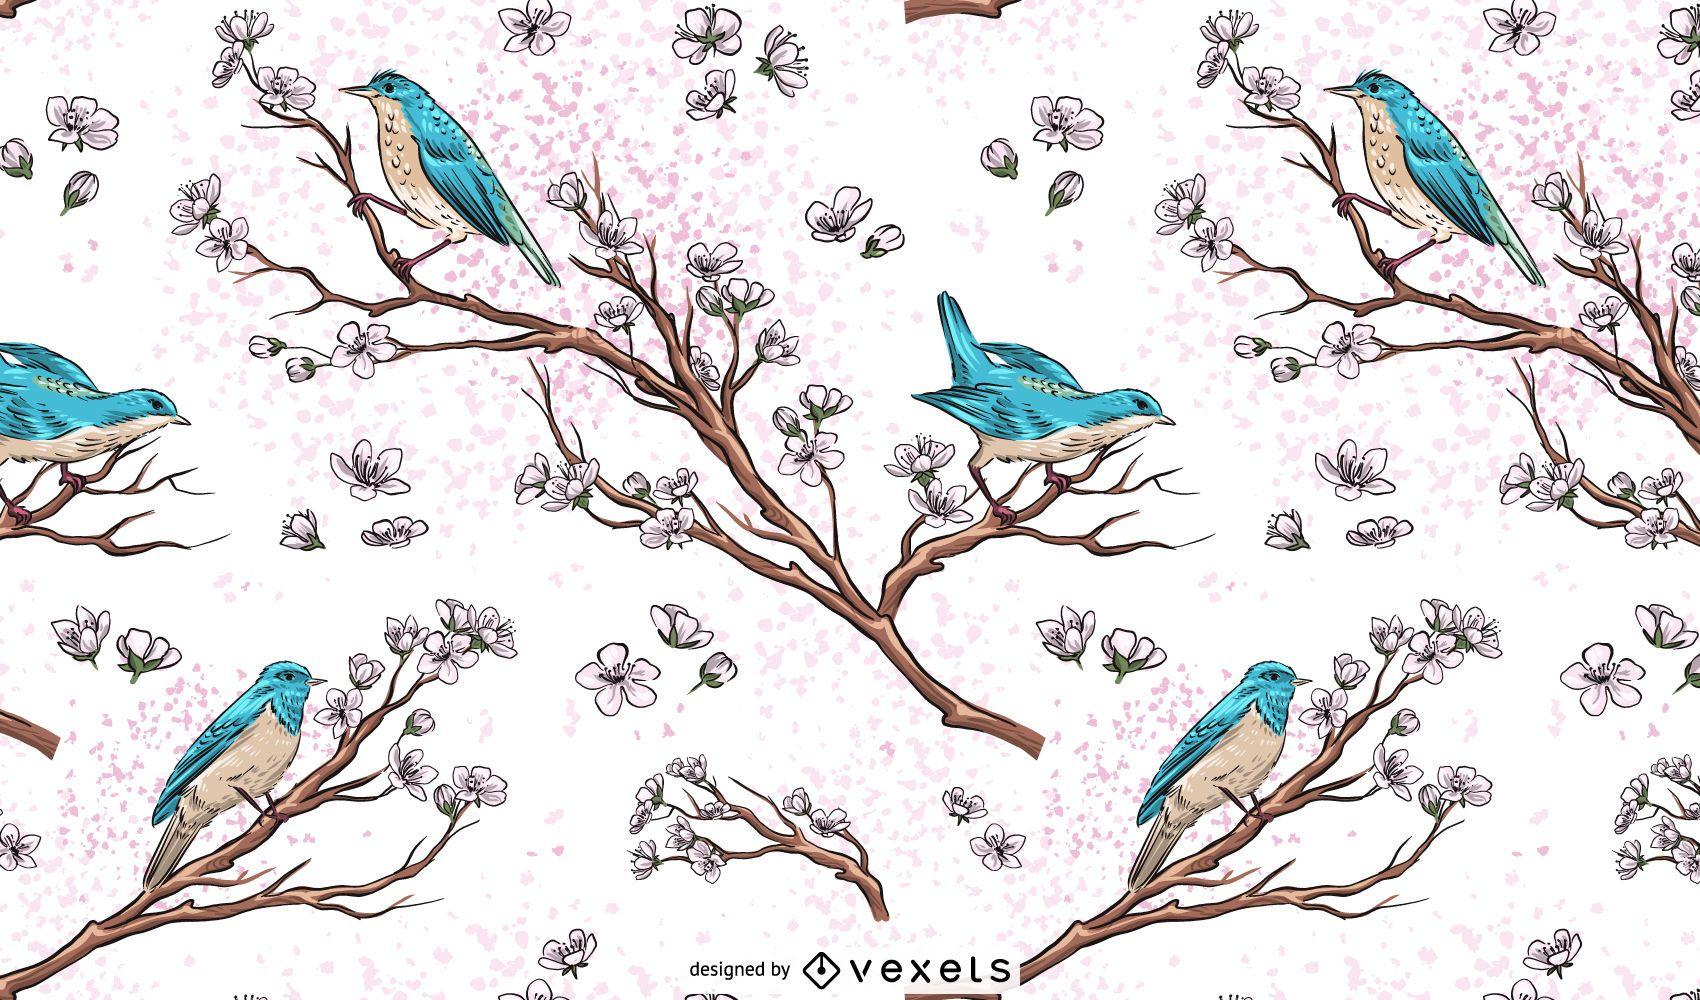 Birds on Branches Wallpaper Illustration